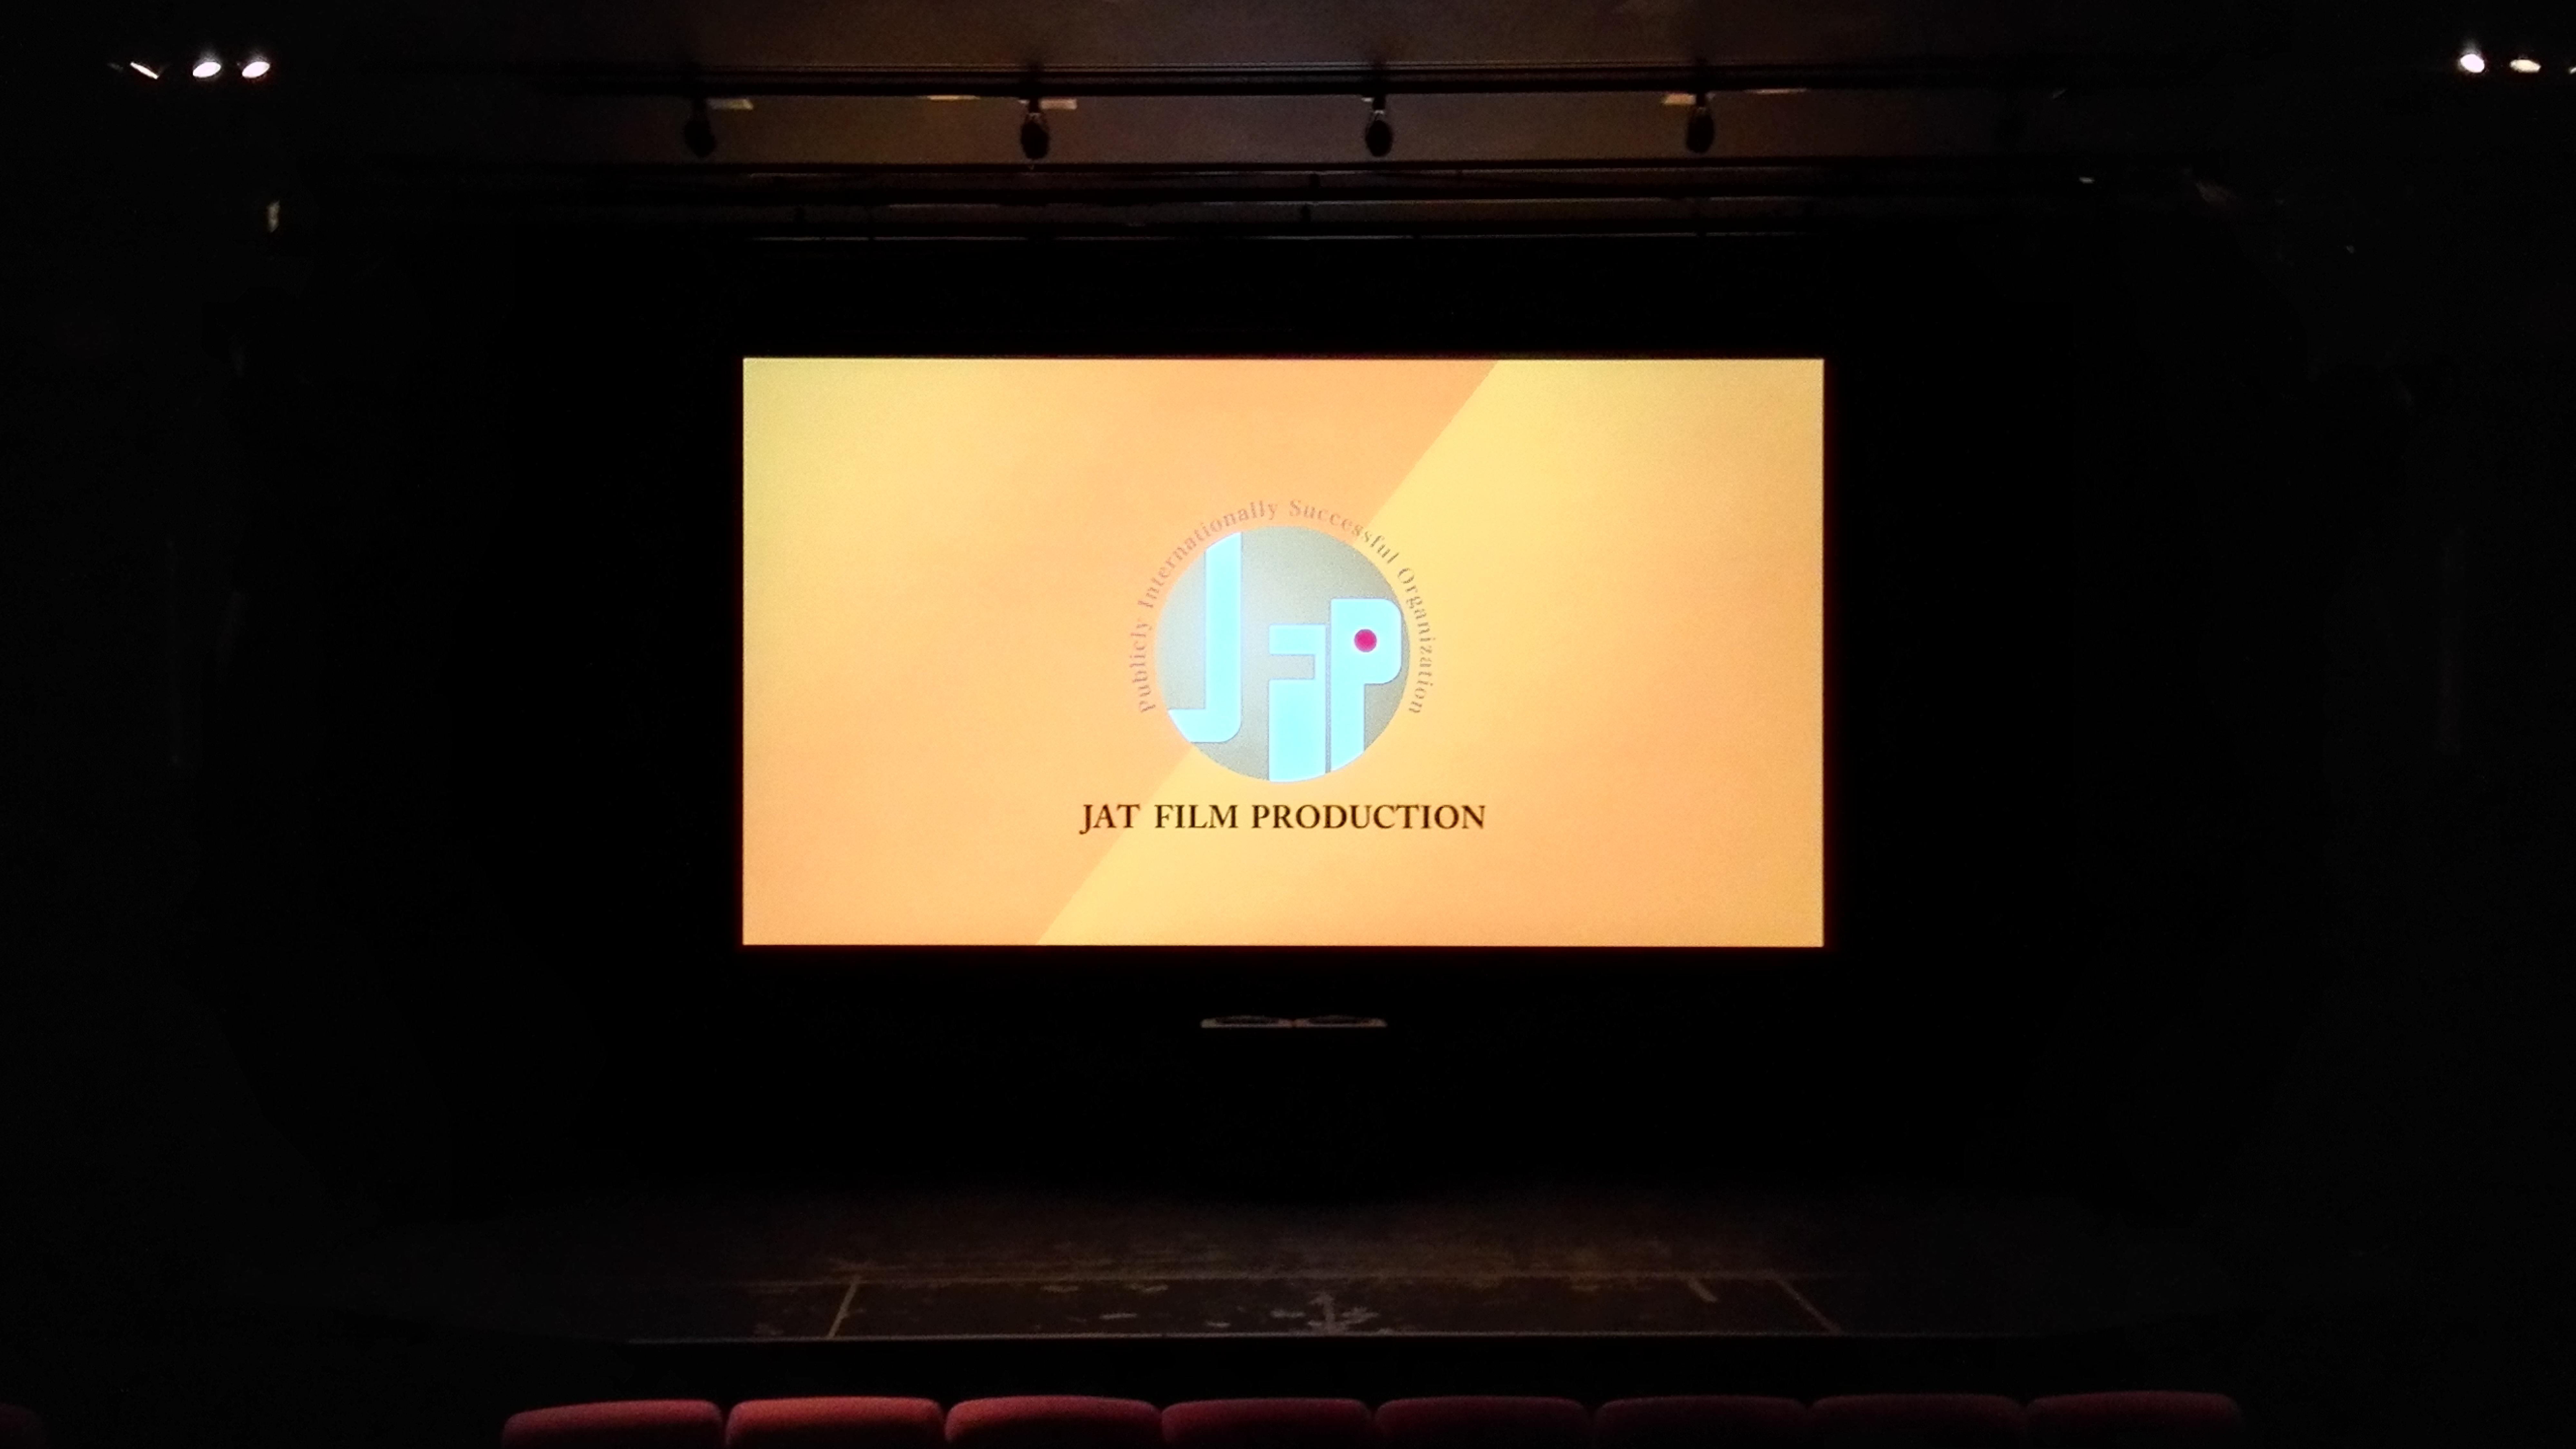 JAT FILM FESTIVAL